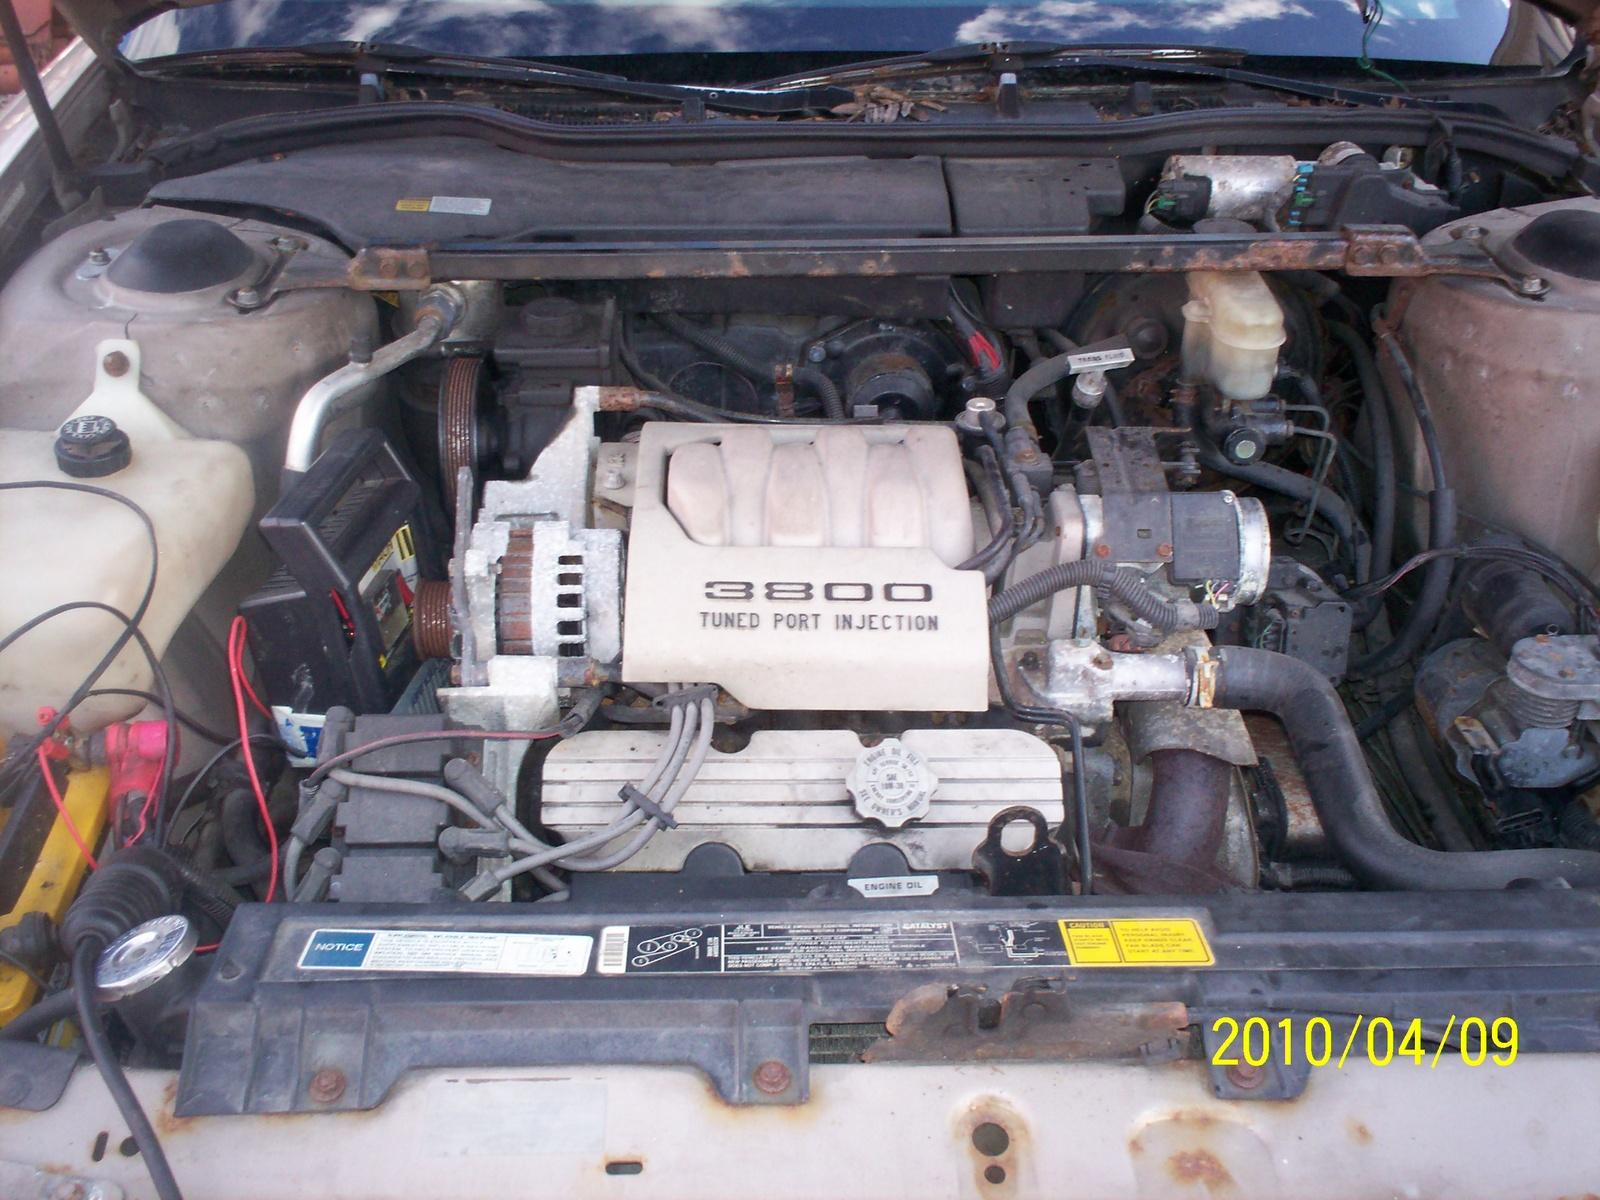 1996 Buick Park Avenue Engine Diagram 95 Wiring 2002 Vehicle Diagrams Rh Eklablog Co 1995